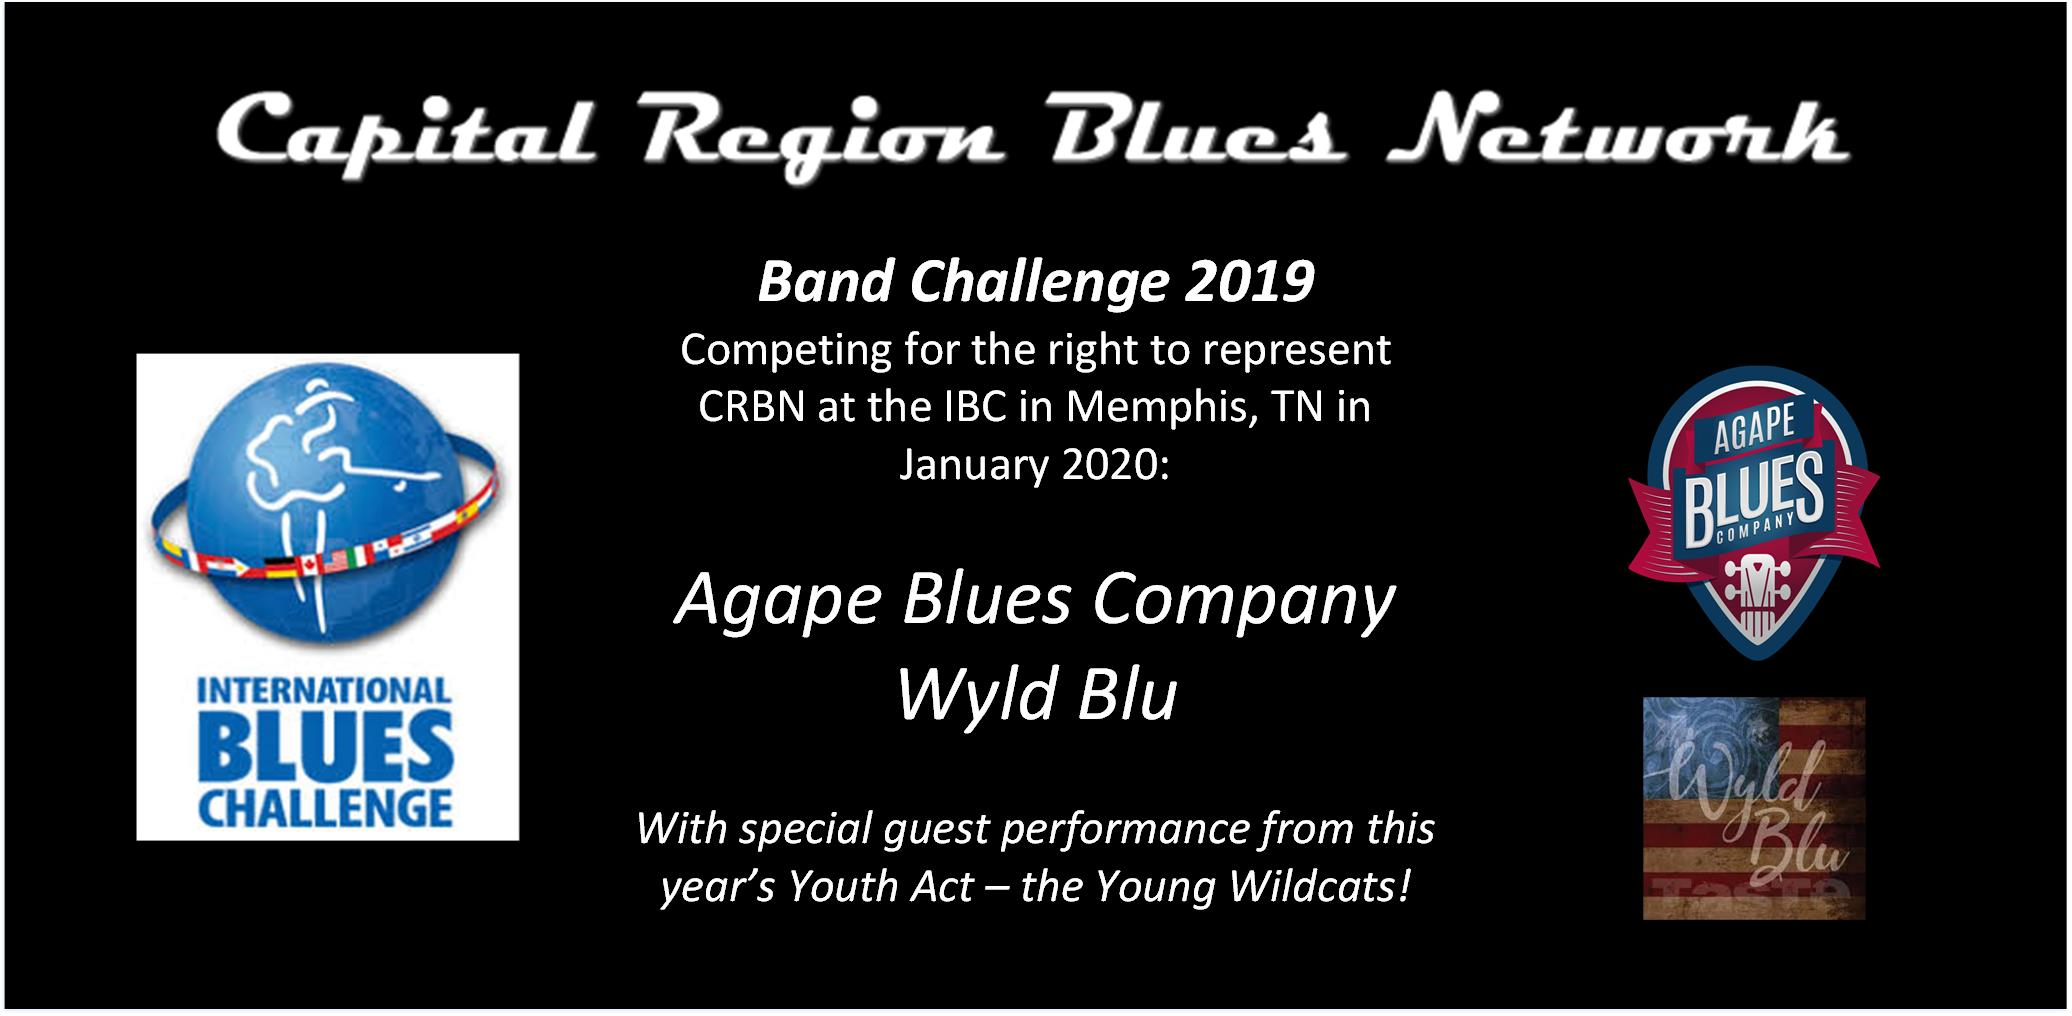 Capital Region Blues Network | Band Challenge 2019